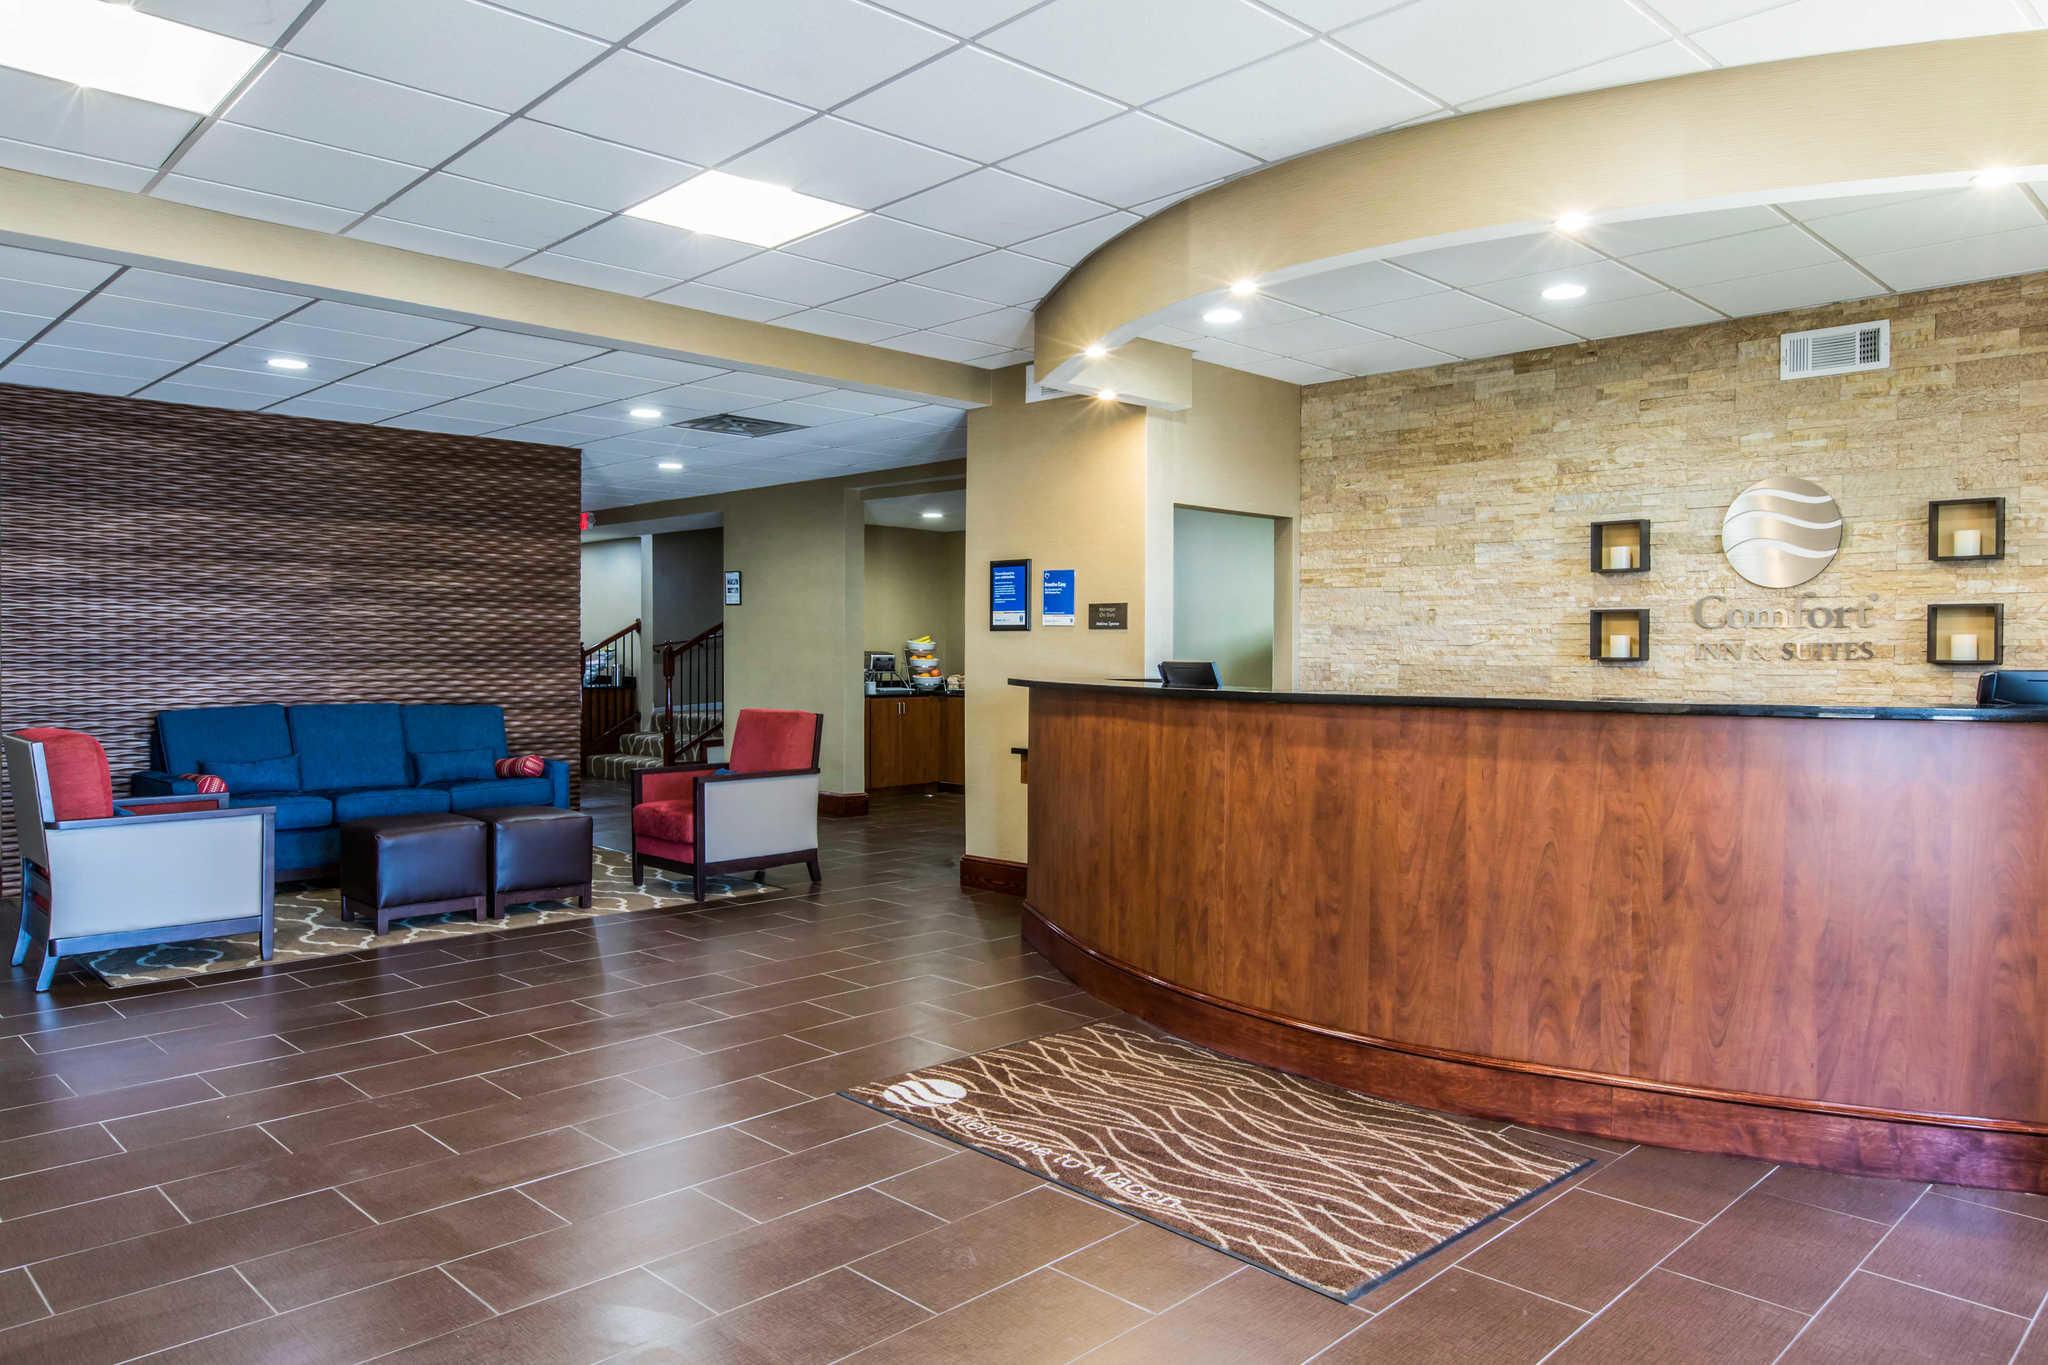 Comfort Inn & Suites West image 6